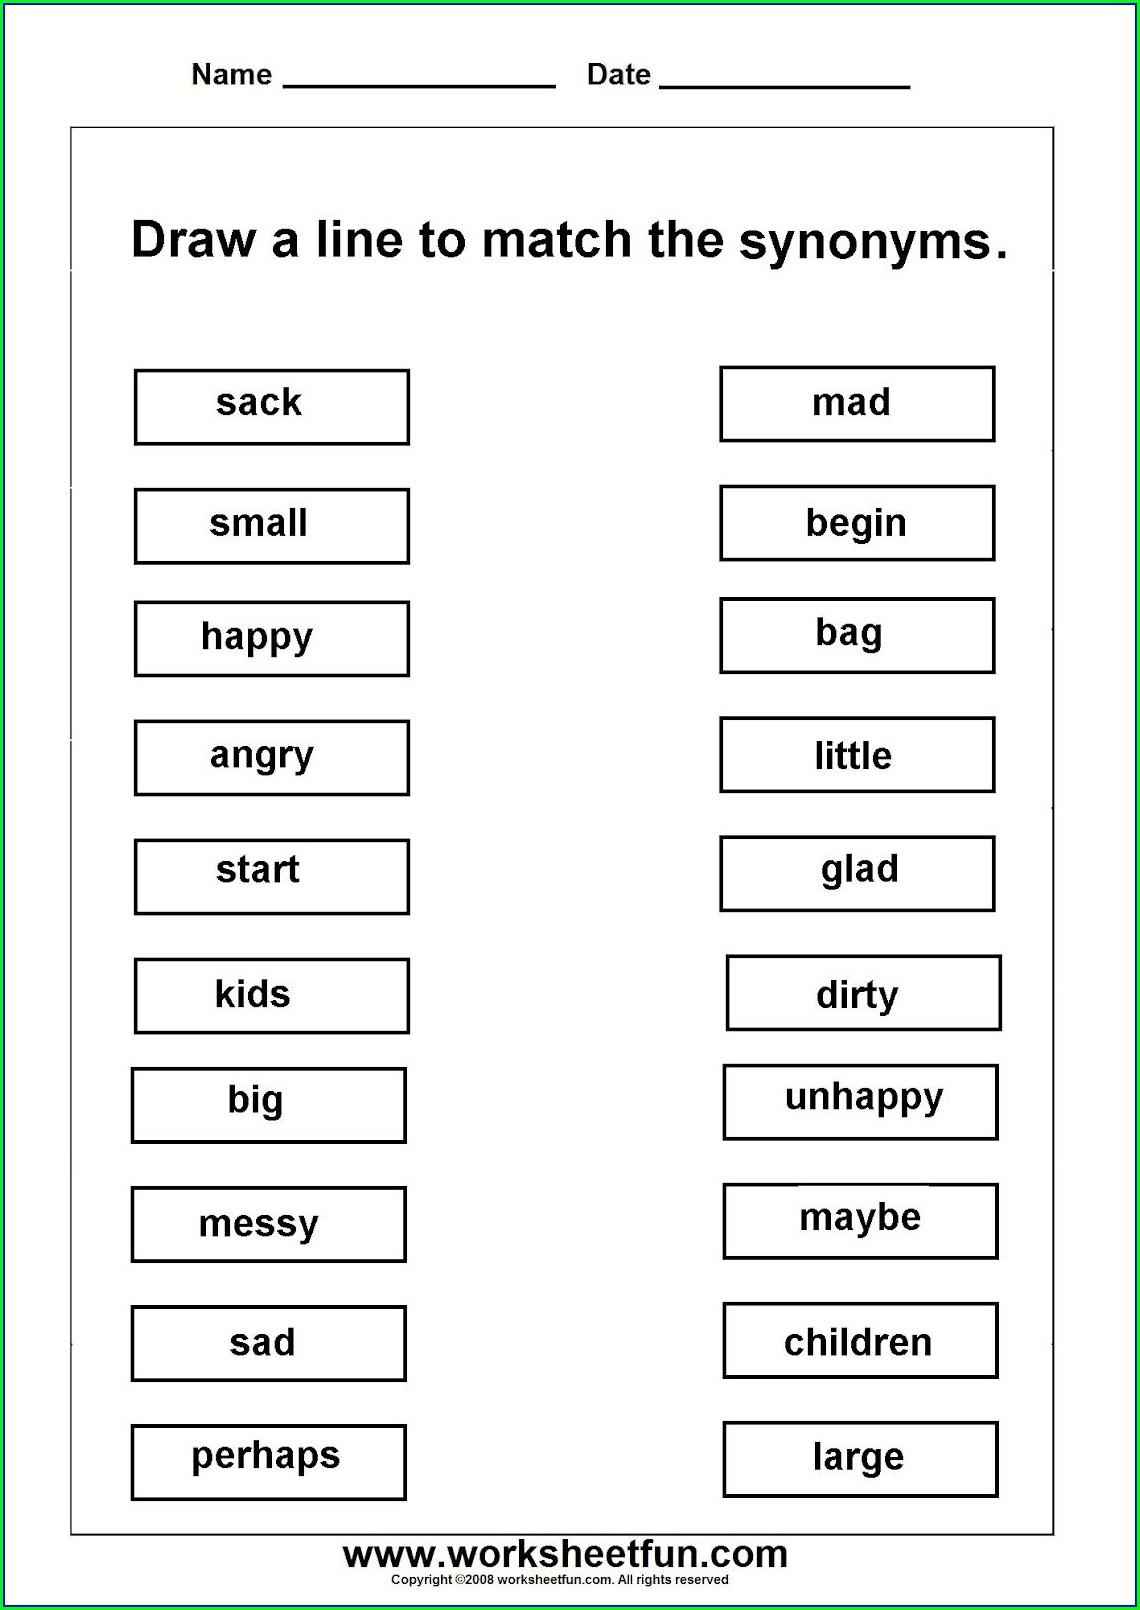 Free Printable 2nd Grade English Worksheets